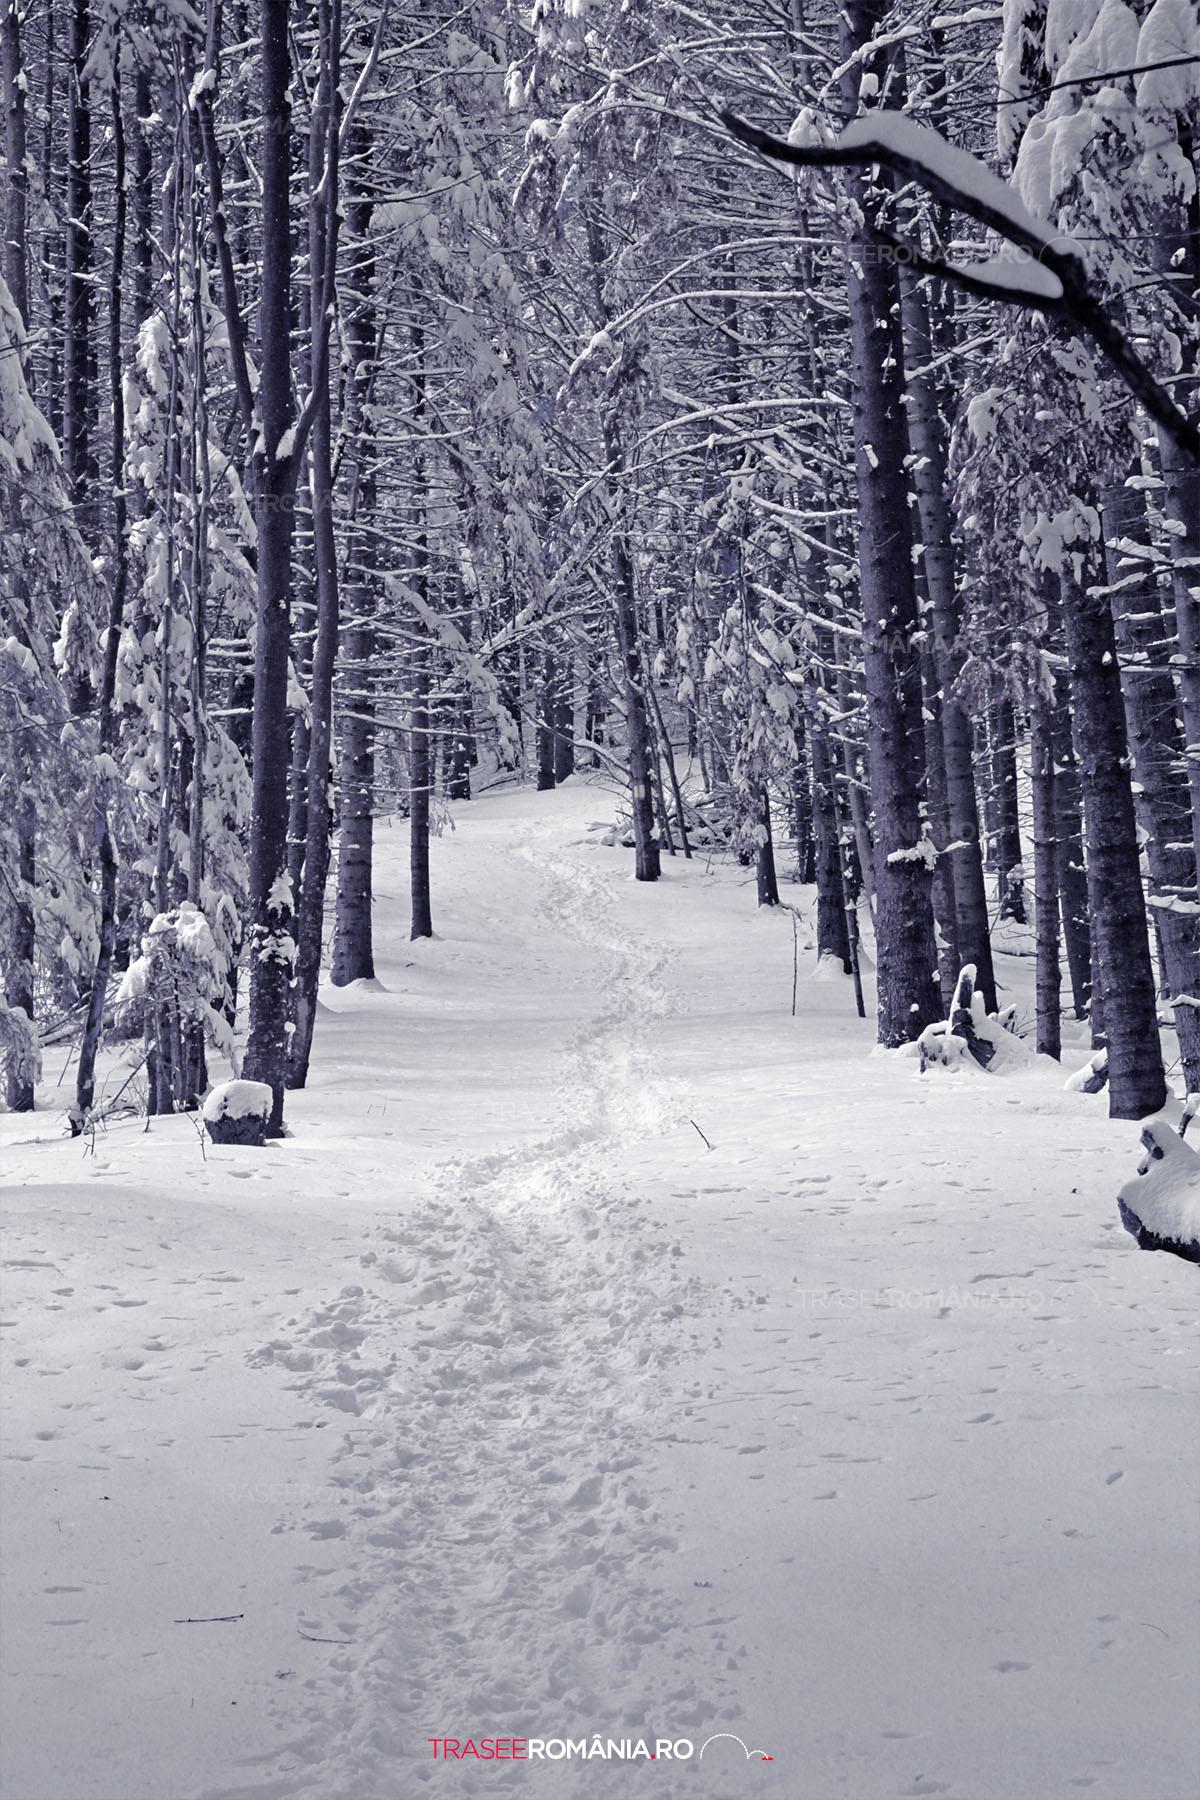 Traseu de iarna spre Cabana Malaesti